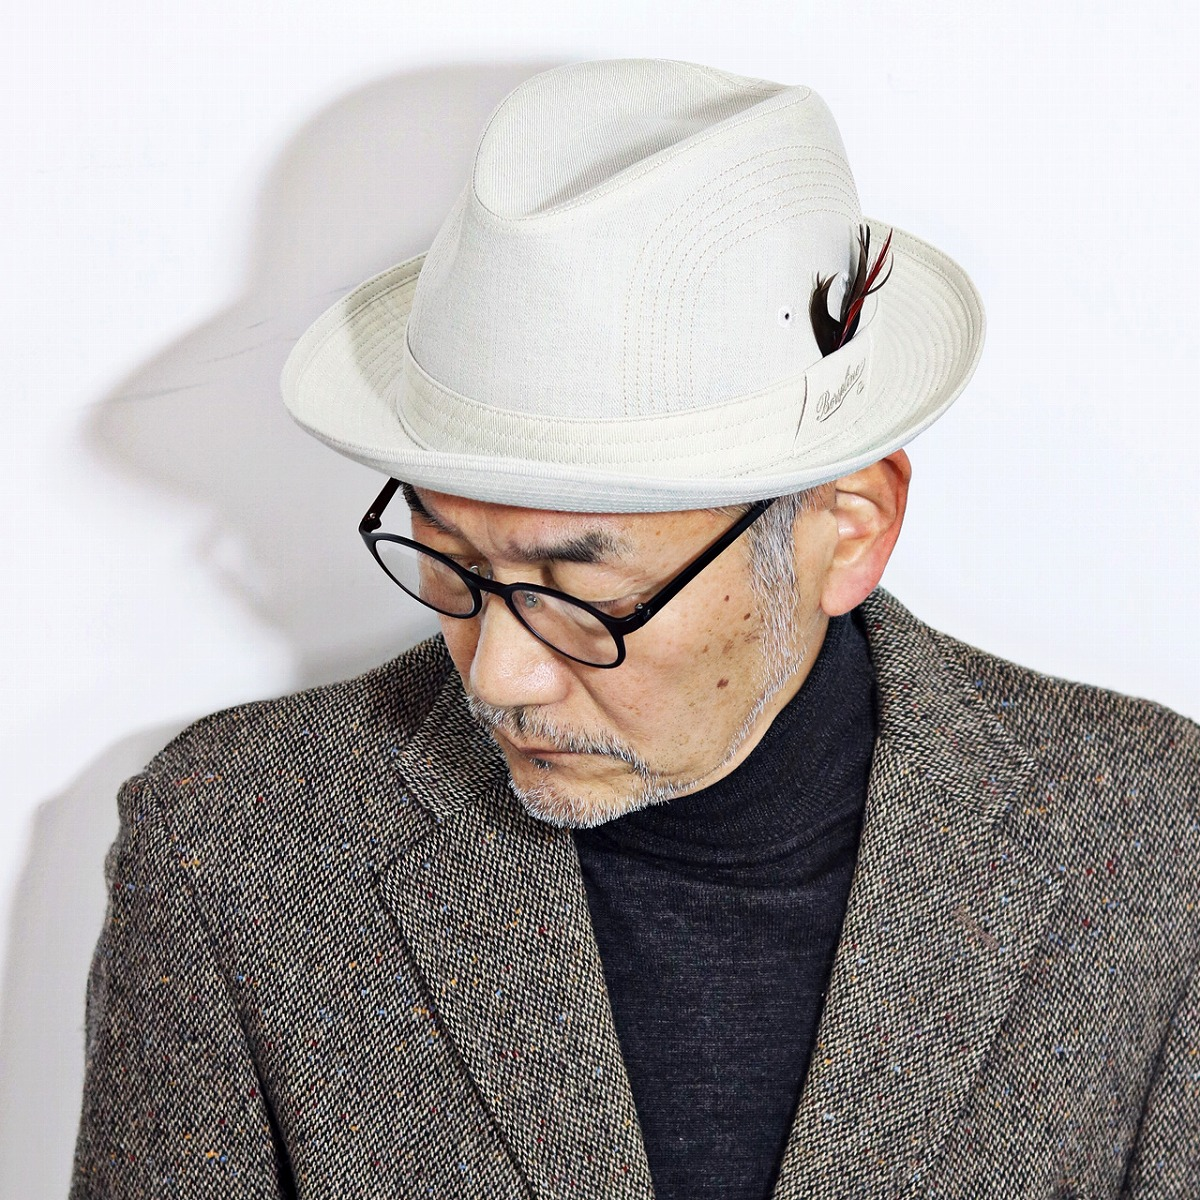 Borsalino ハット メンズ 春 夏 ボルサリーノ 帽子 日本製 57cm 58cm 59cm 60cm 中折れハット 羽根付き リネン 帽子 海外ブランド 涼しい 中折れ帽 紳士 シンプル ブランドロゴ入り 白 オフホワイト [ fedora ]